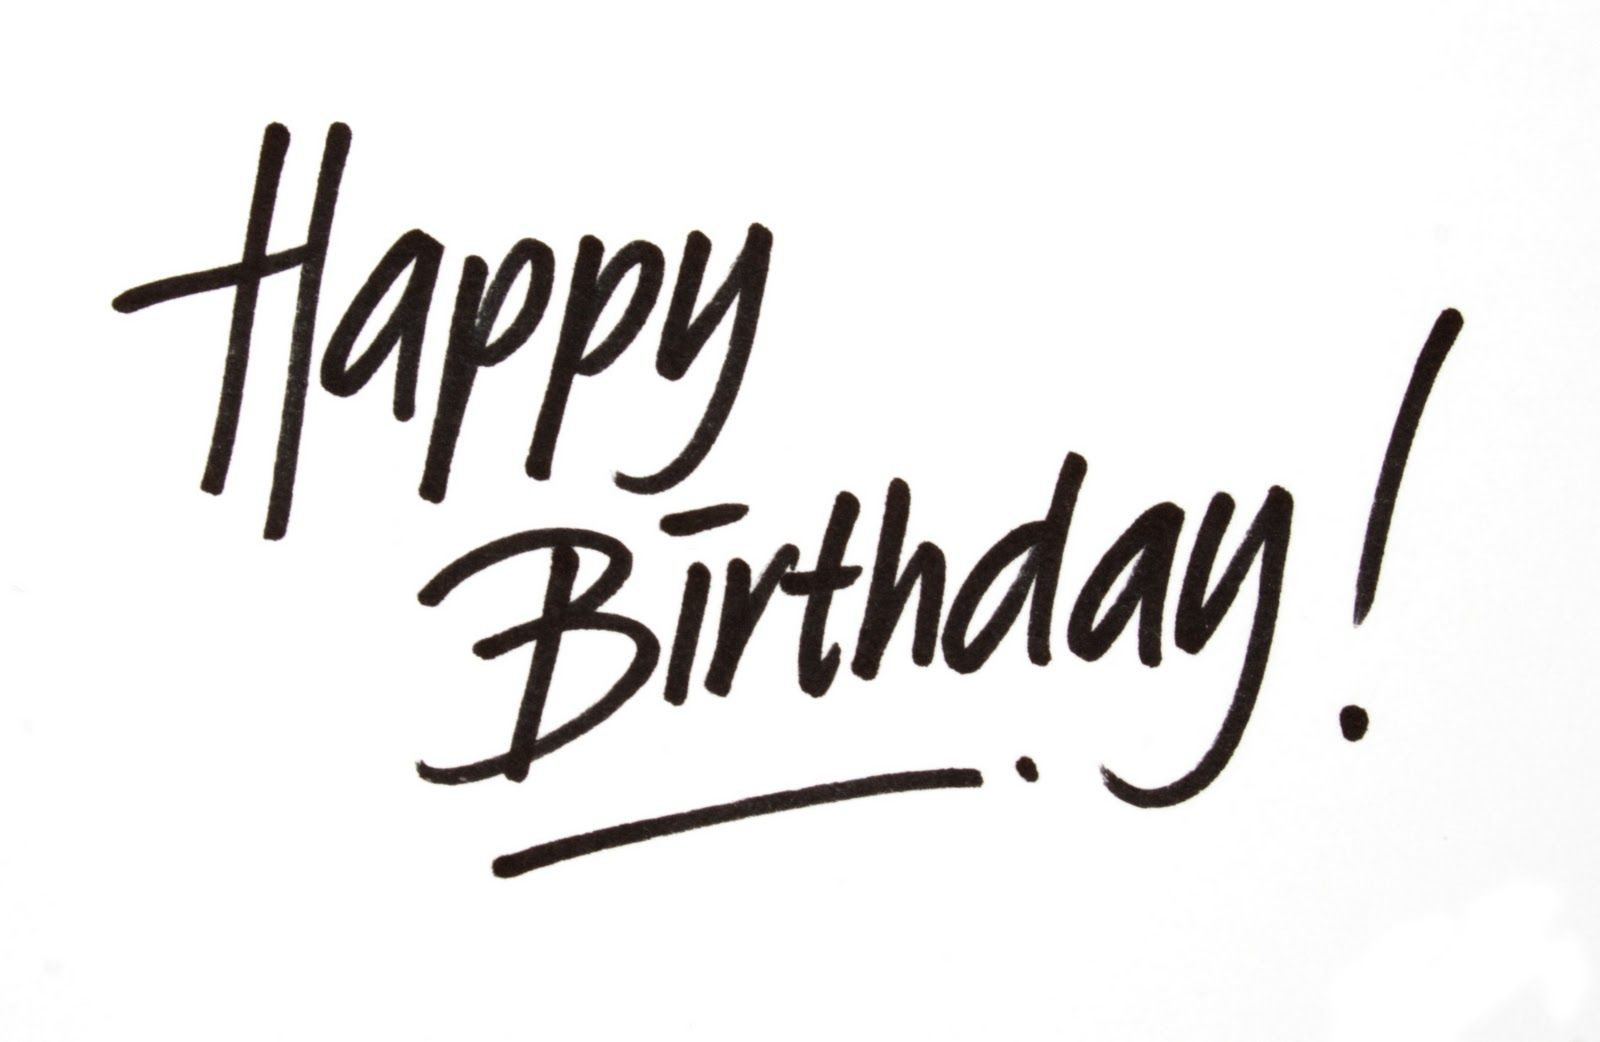 Http Www Happybirthdaywishesonline Com Birthday Happy Birthday Wishes In Different Fonts